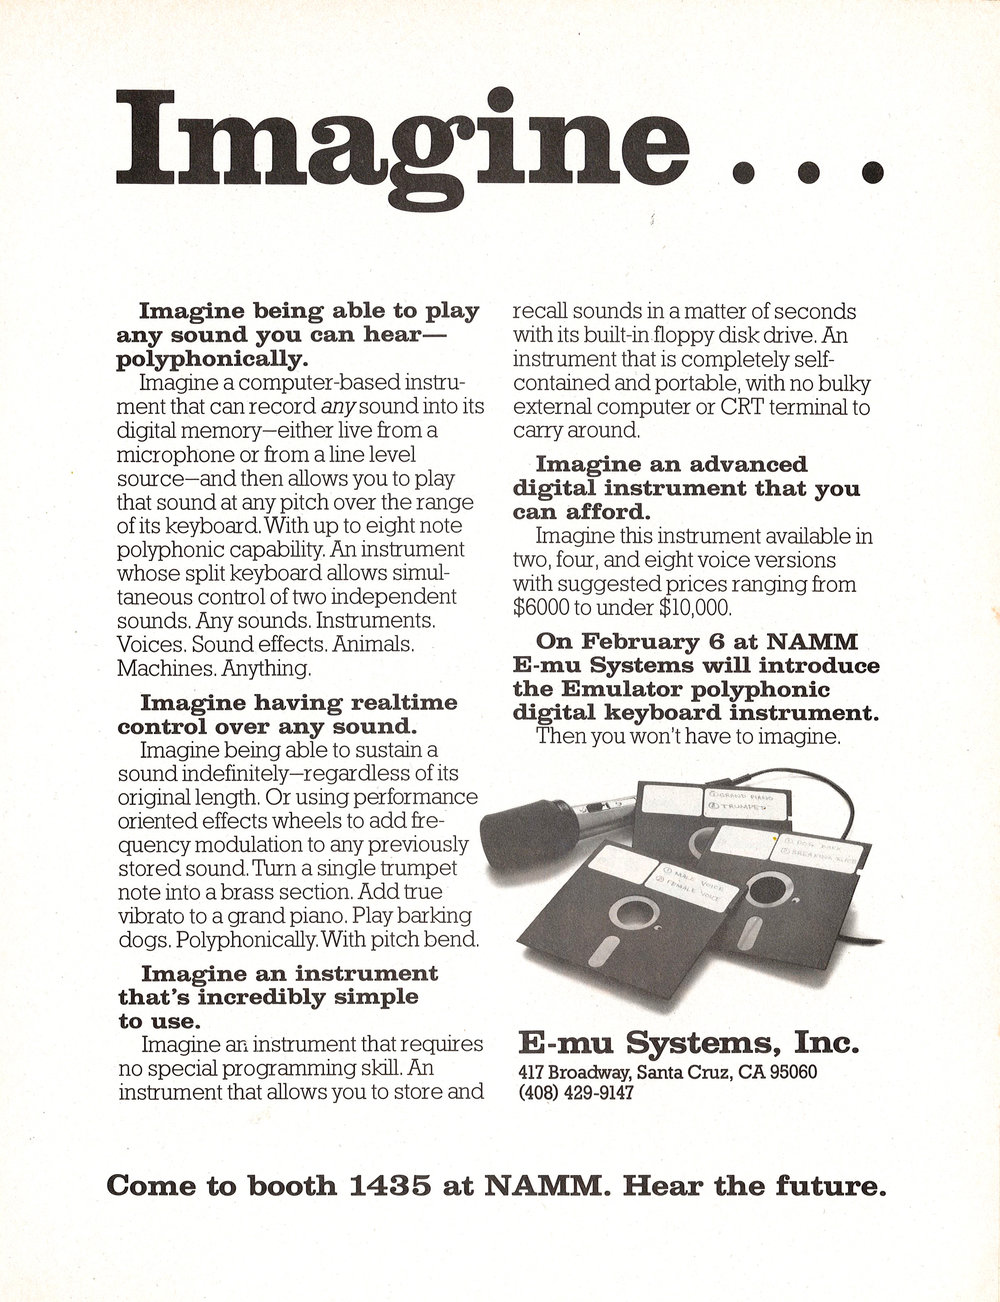 WLWLTDOO-1981-AD-EMULATOR-NAMM.jpg